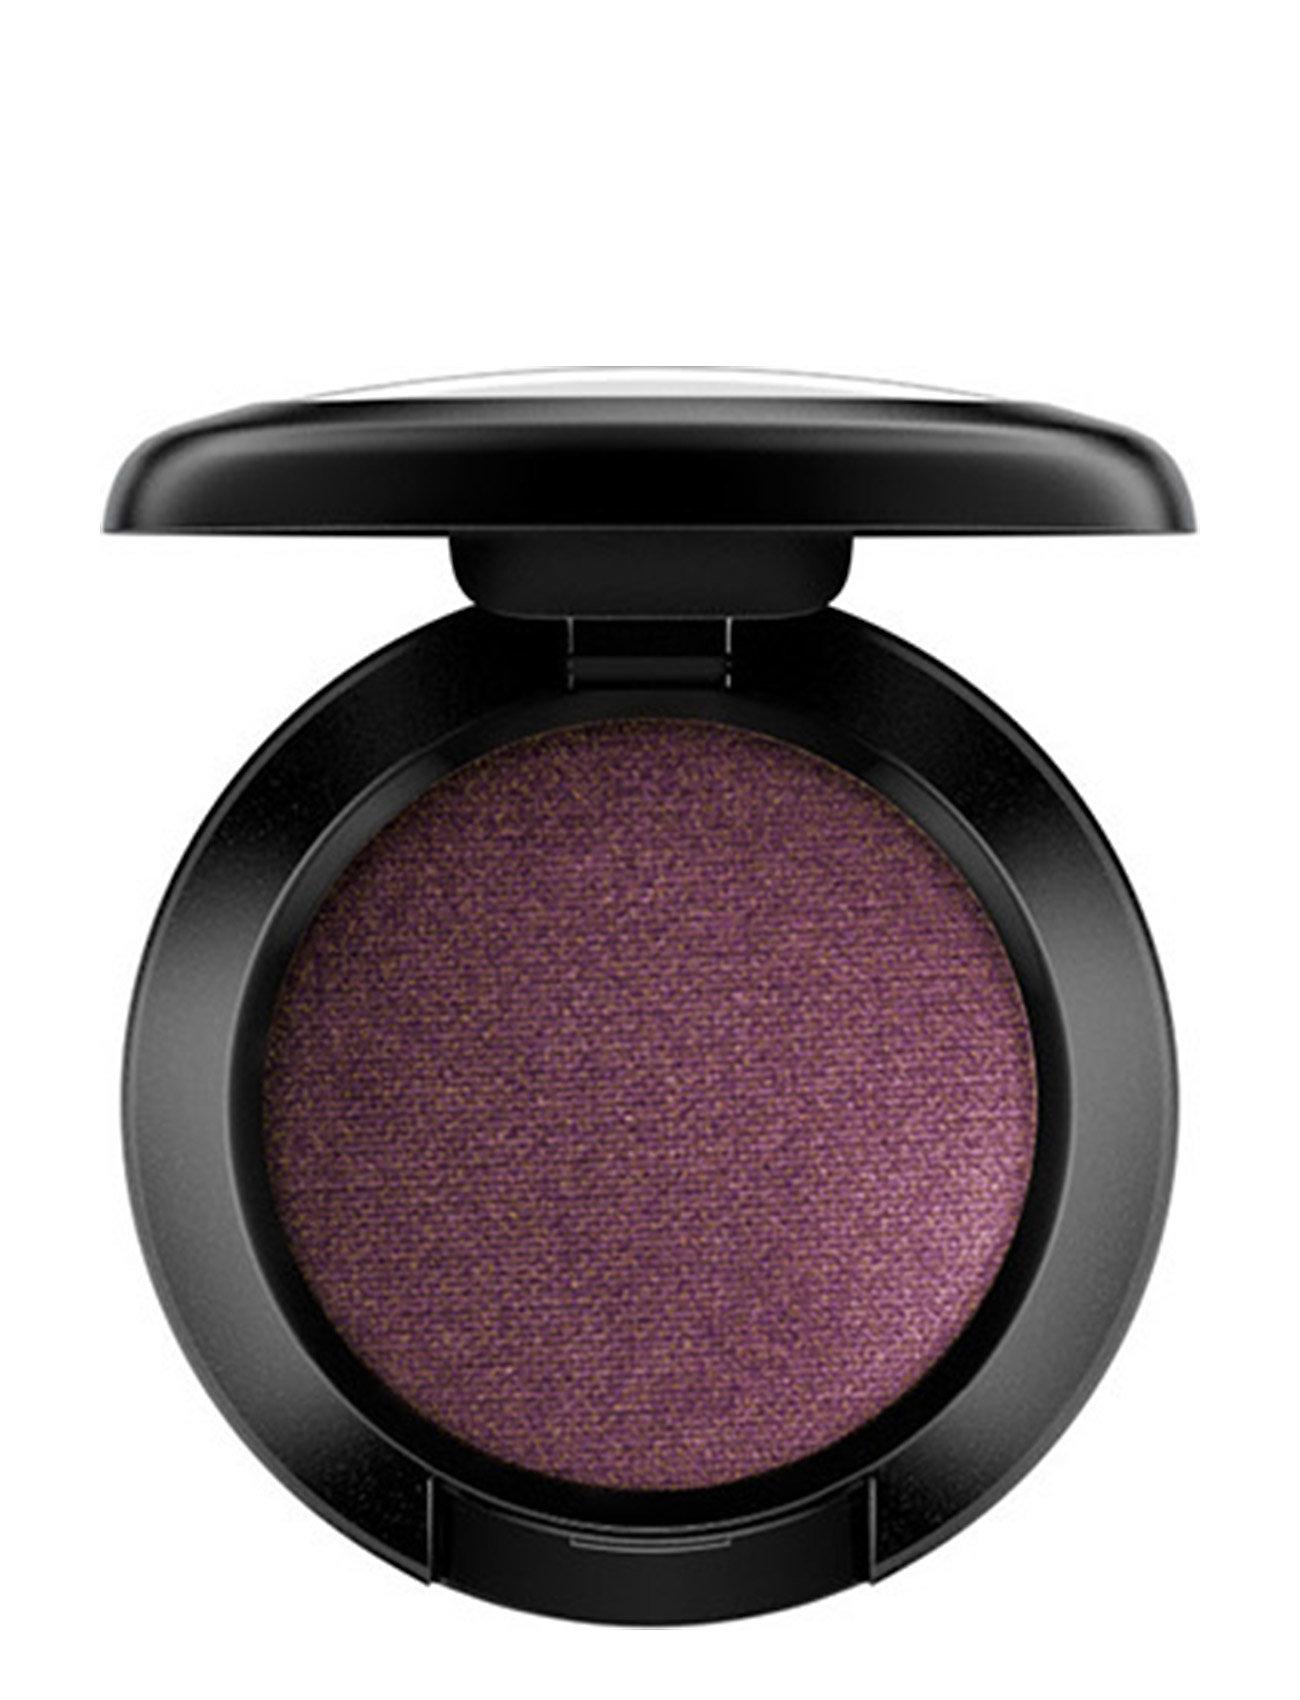 Image of Velvet Beauty Marked Beauty WOMEN Makeup Eyes Eyeshadows Eyeshadow - Not Palettes Lilla M.A.C. (3067517113)